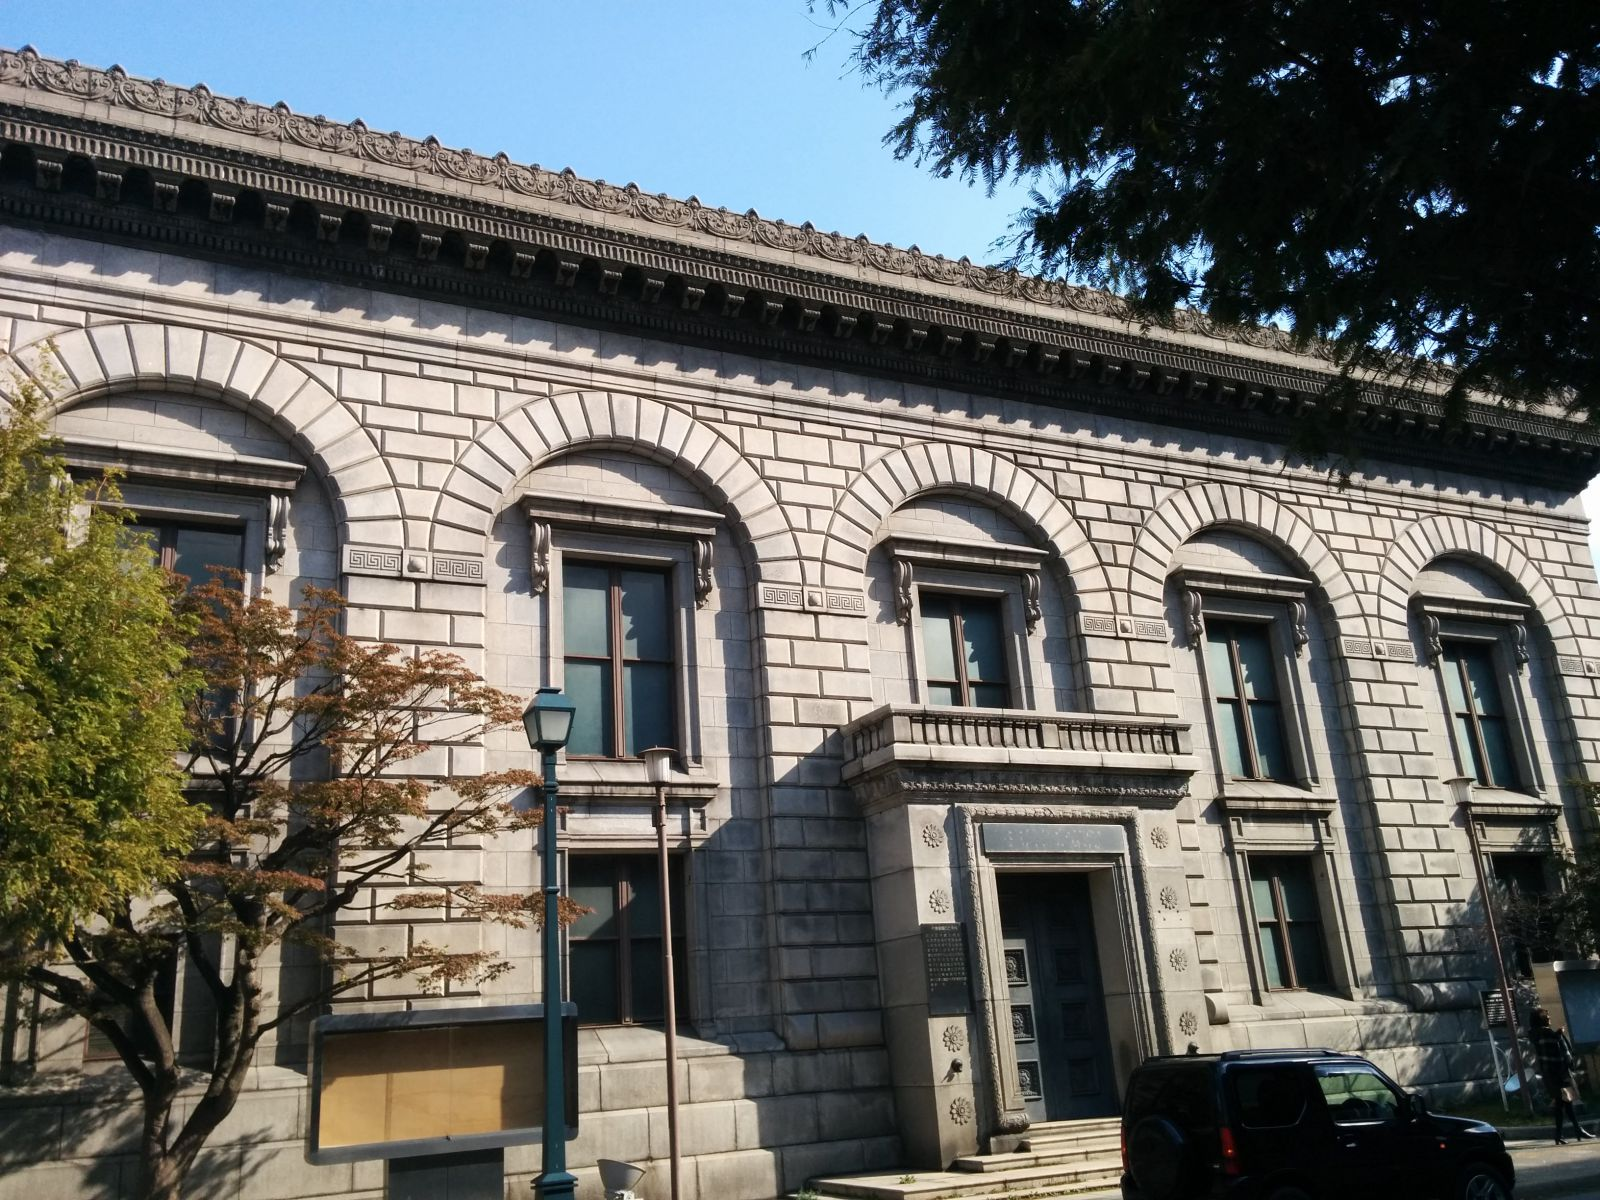 【小樽】旧三井銀行小樽支店観光案内です。